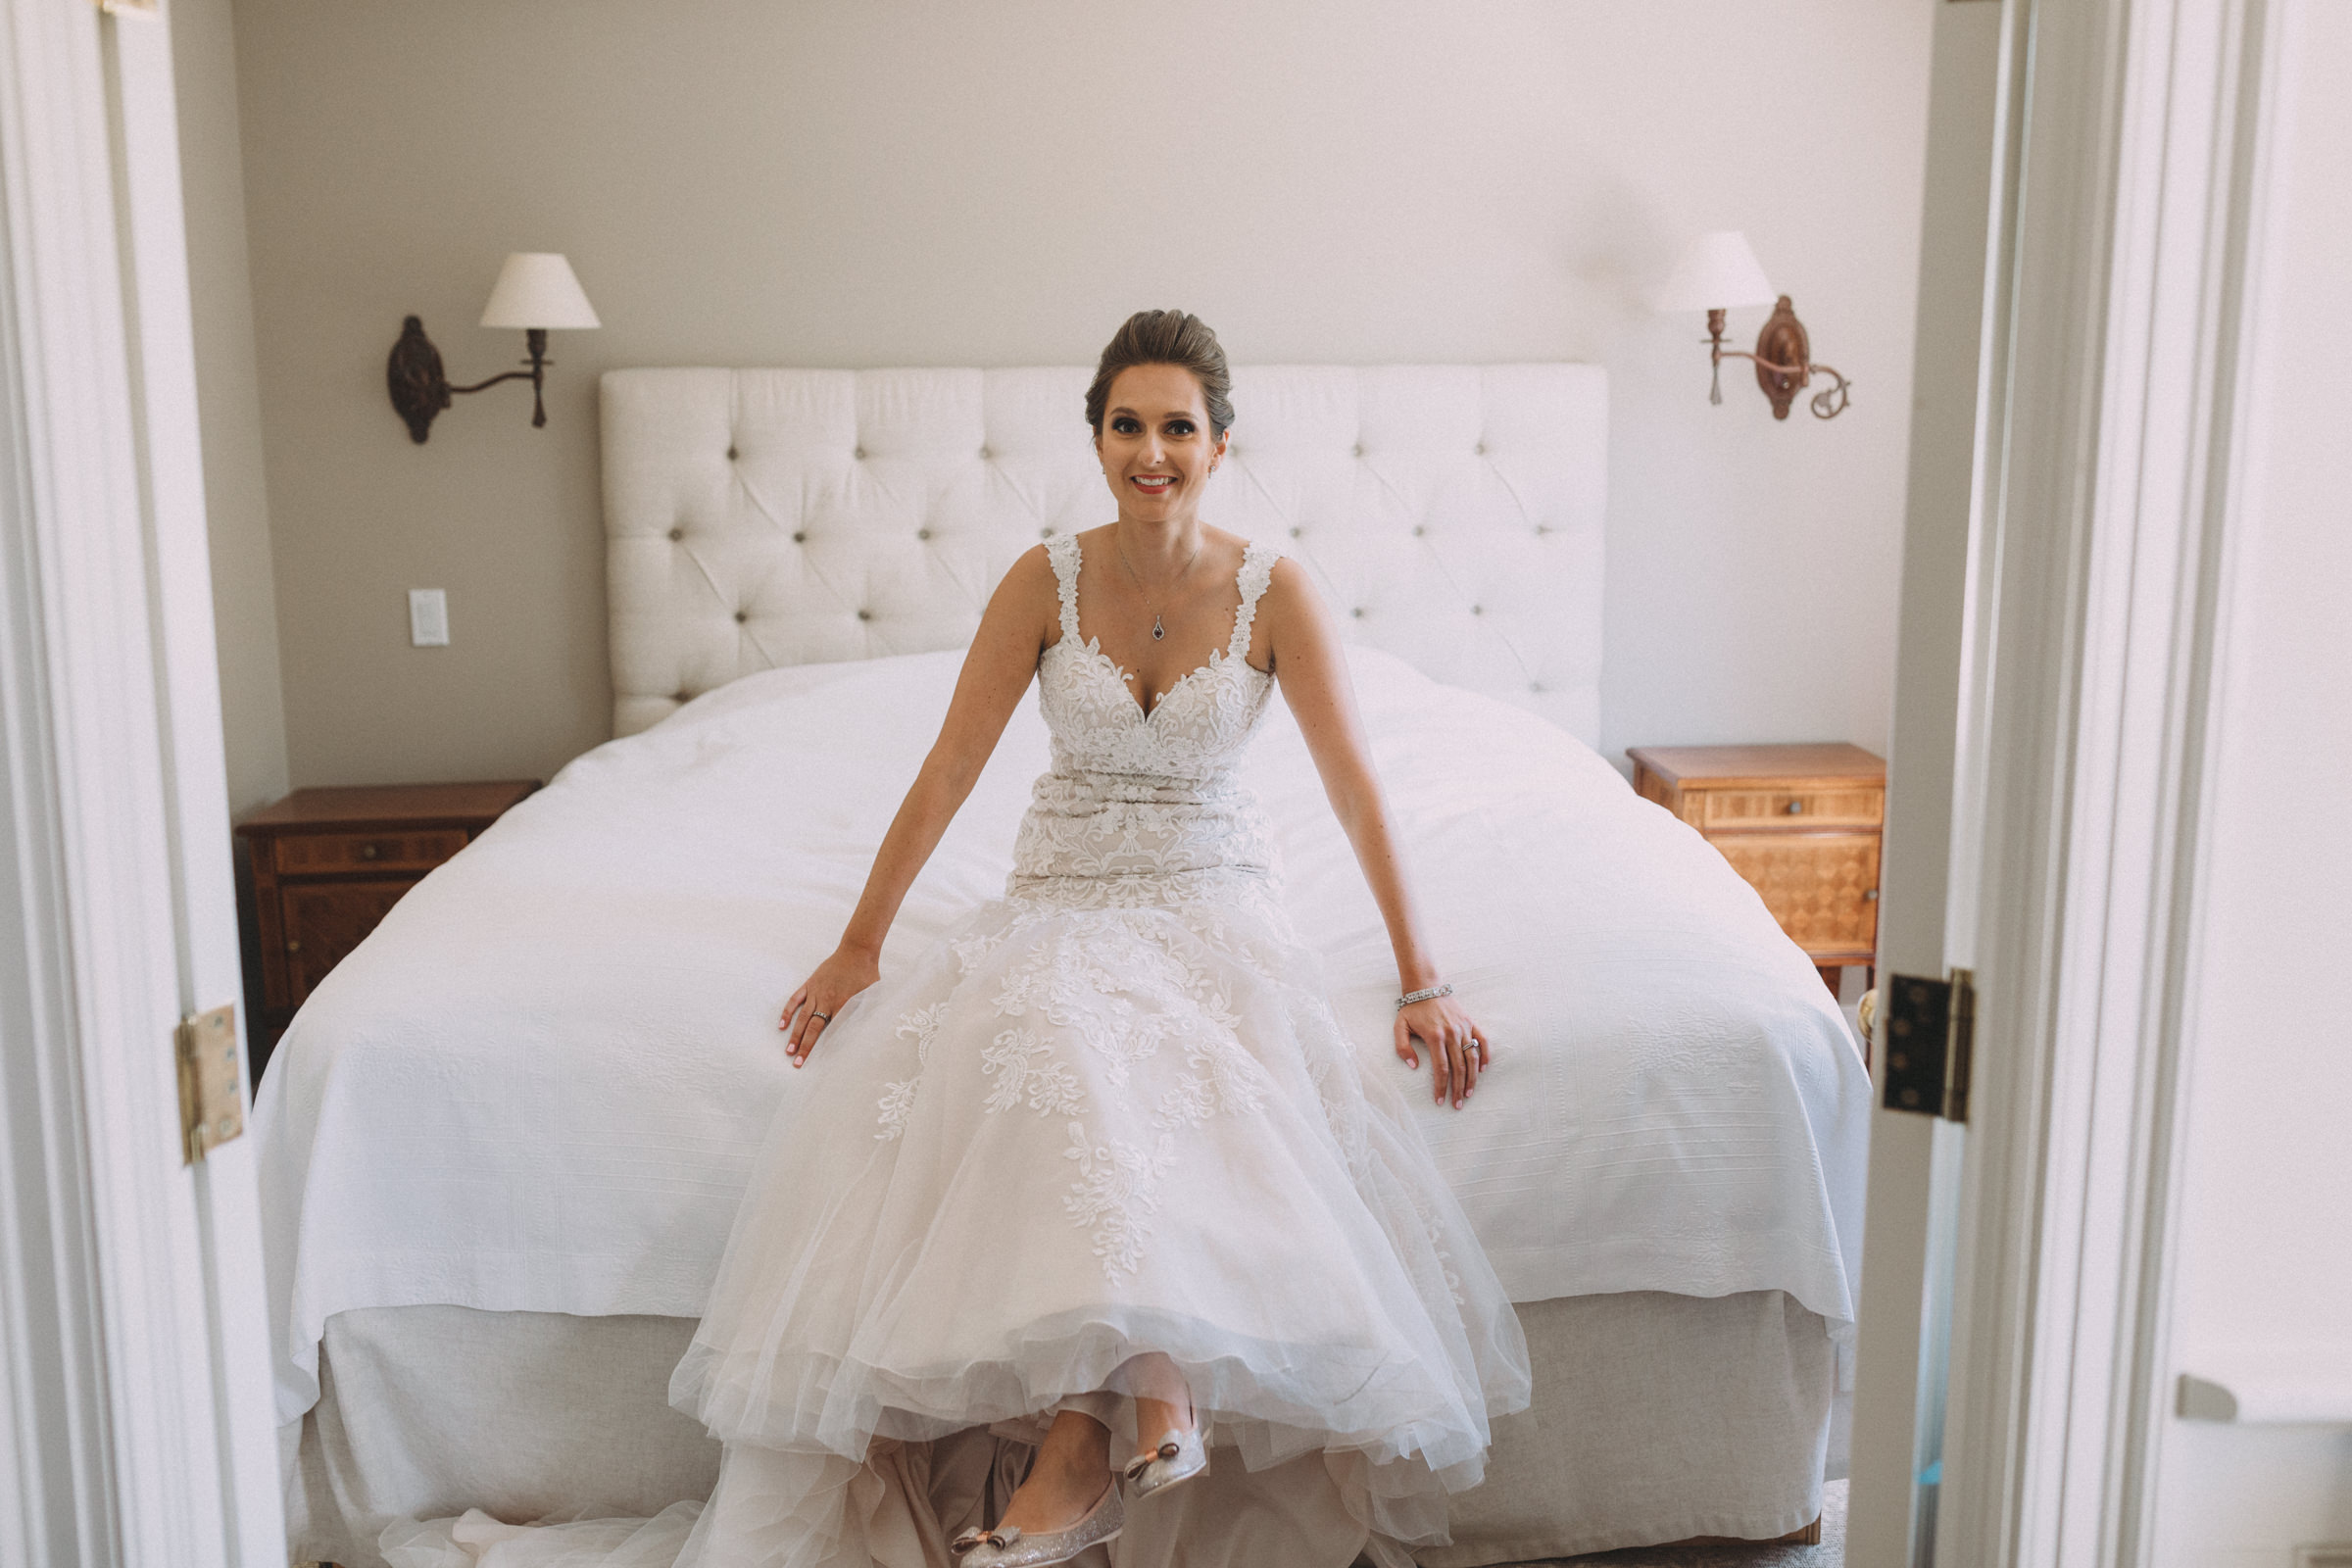 Langdon-Hall-wedding-photography-Cambridge-by-Sam-Wong-of-Visual-Cravings_Sarah-Ryan_12.jpg